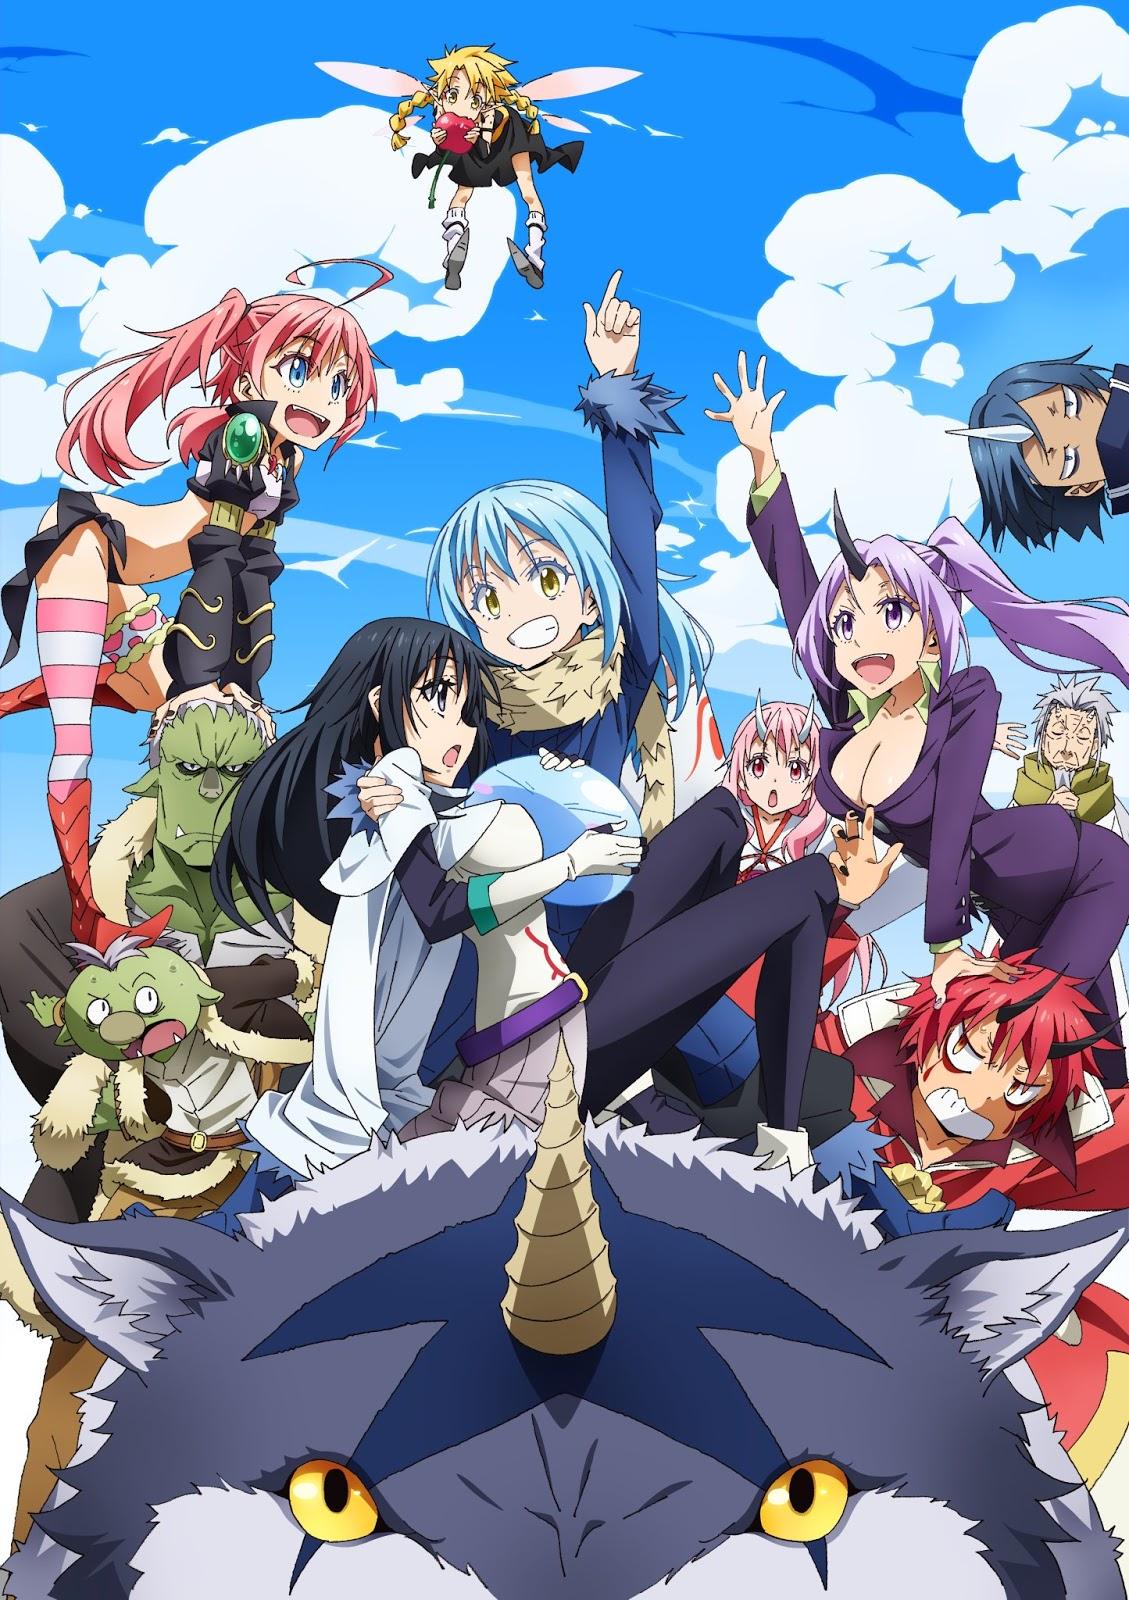 Anime review tensura anime isekai dengan fanservice terbaik